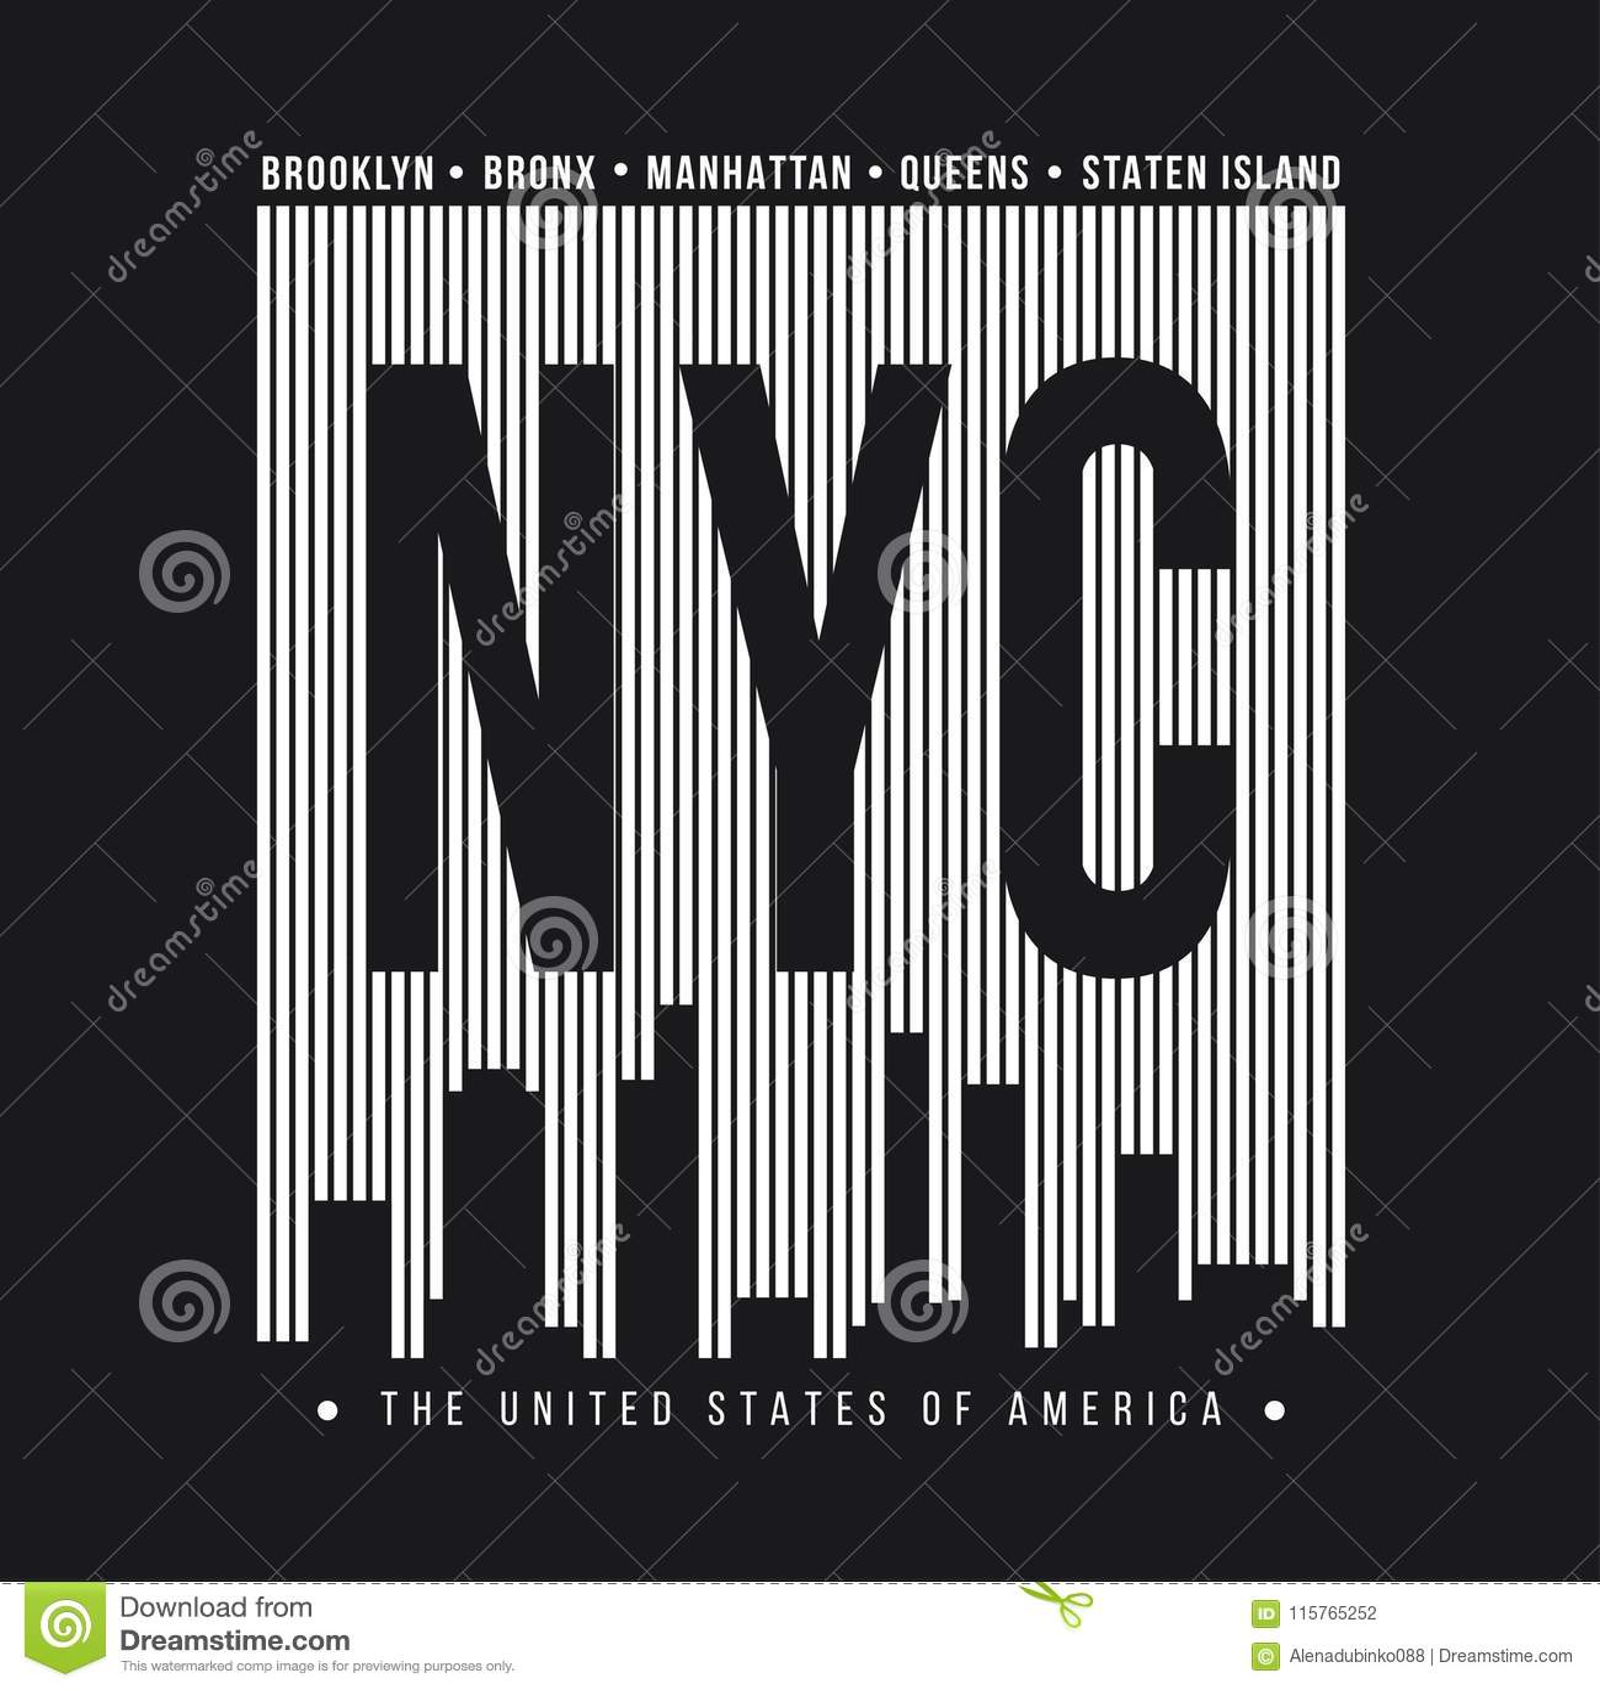 Miasto Nowy Jork dla koszulka druku Nowy Jork linii horyzontu sylwetka Koszulek grafika